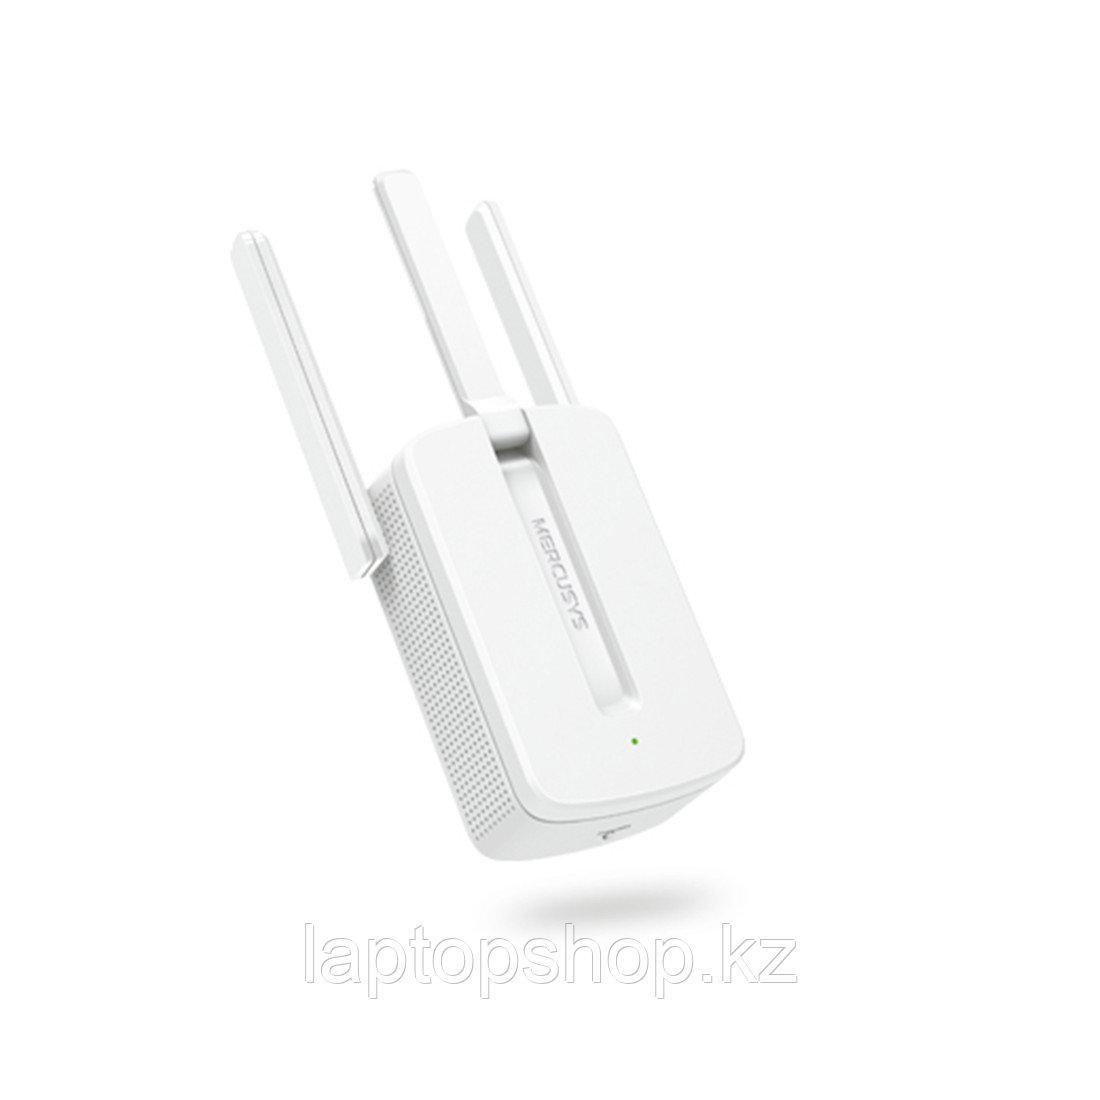 Усилитель Wi-Fi сигнала Mercusys MW300RE, 300 мбит/с